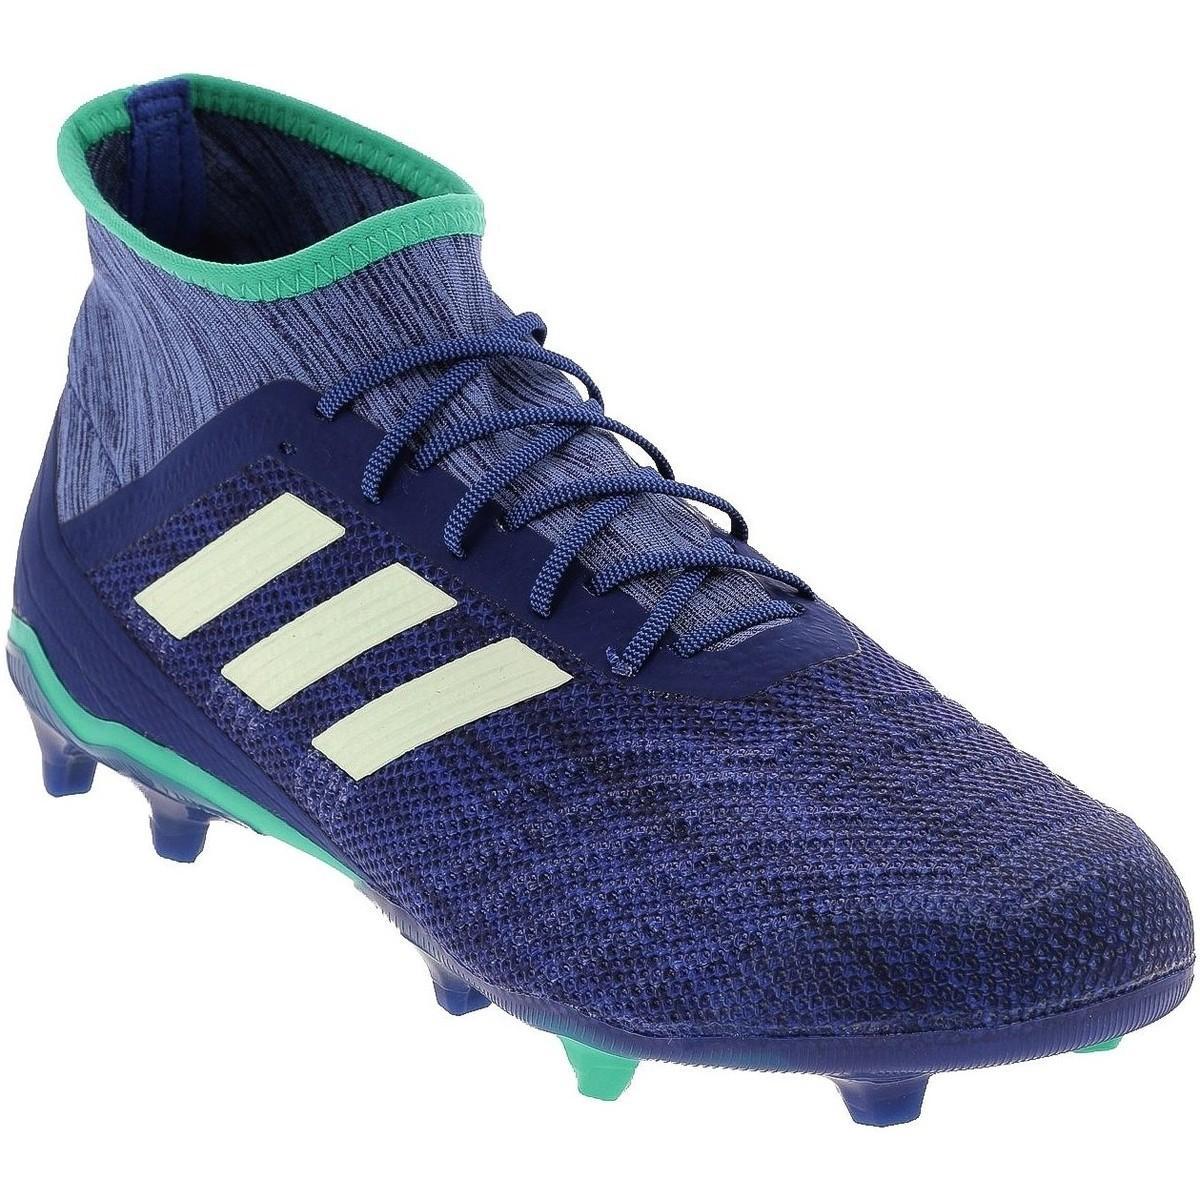 Predator 18.2 fg bleu Chaussures de foot adidas pour homme en ...